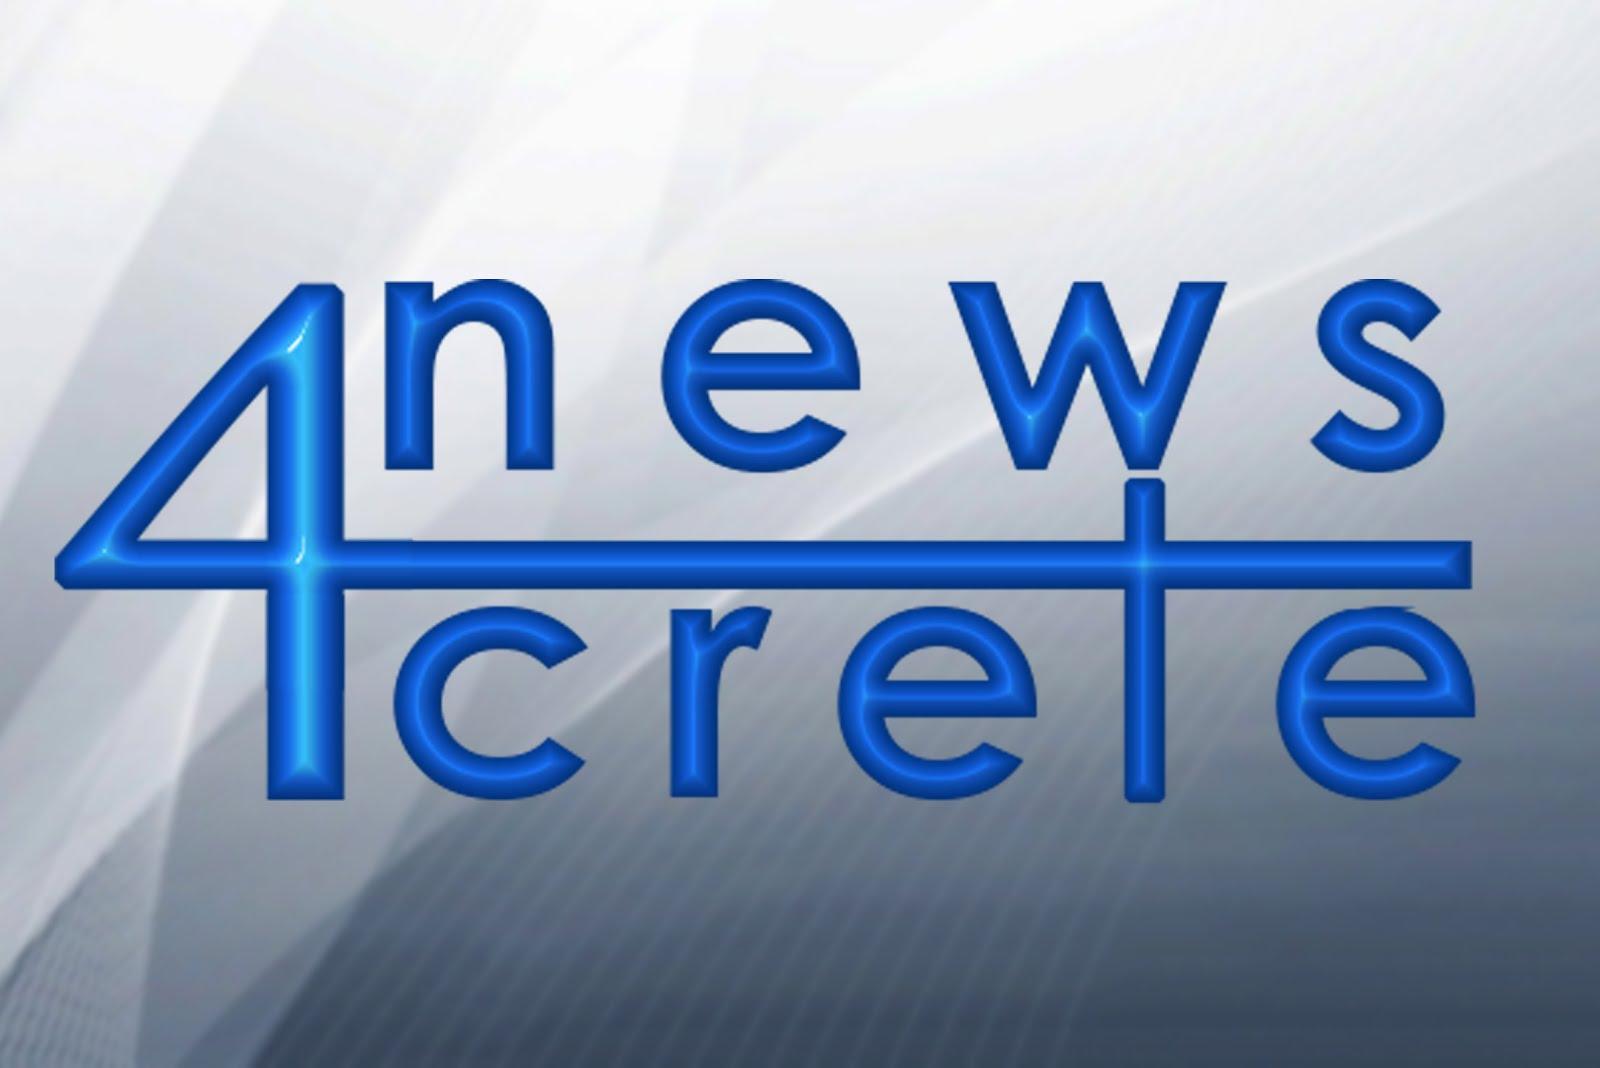 news4crete